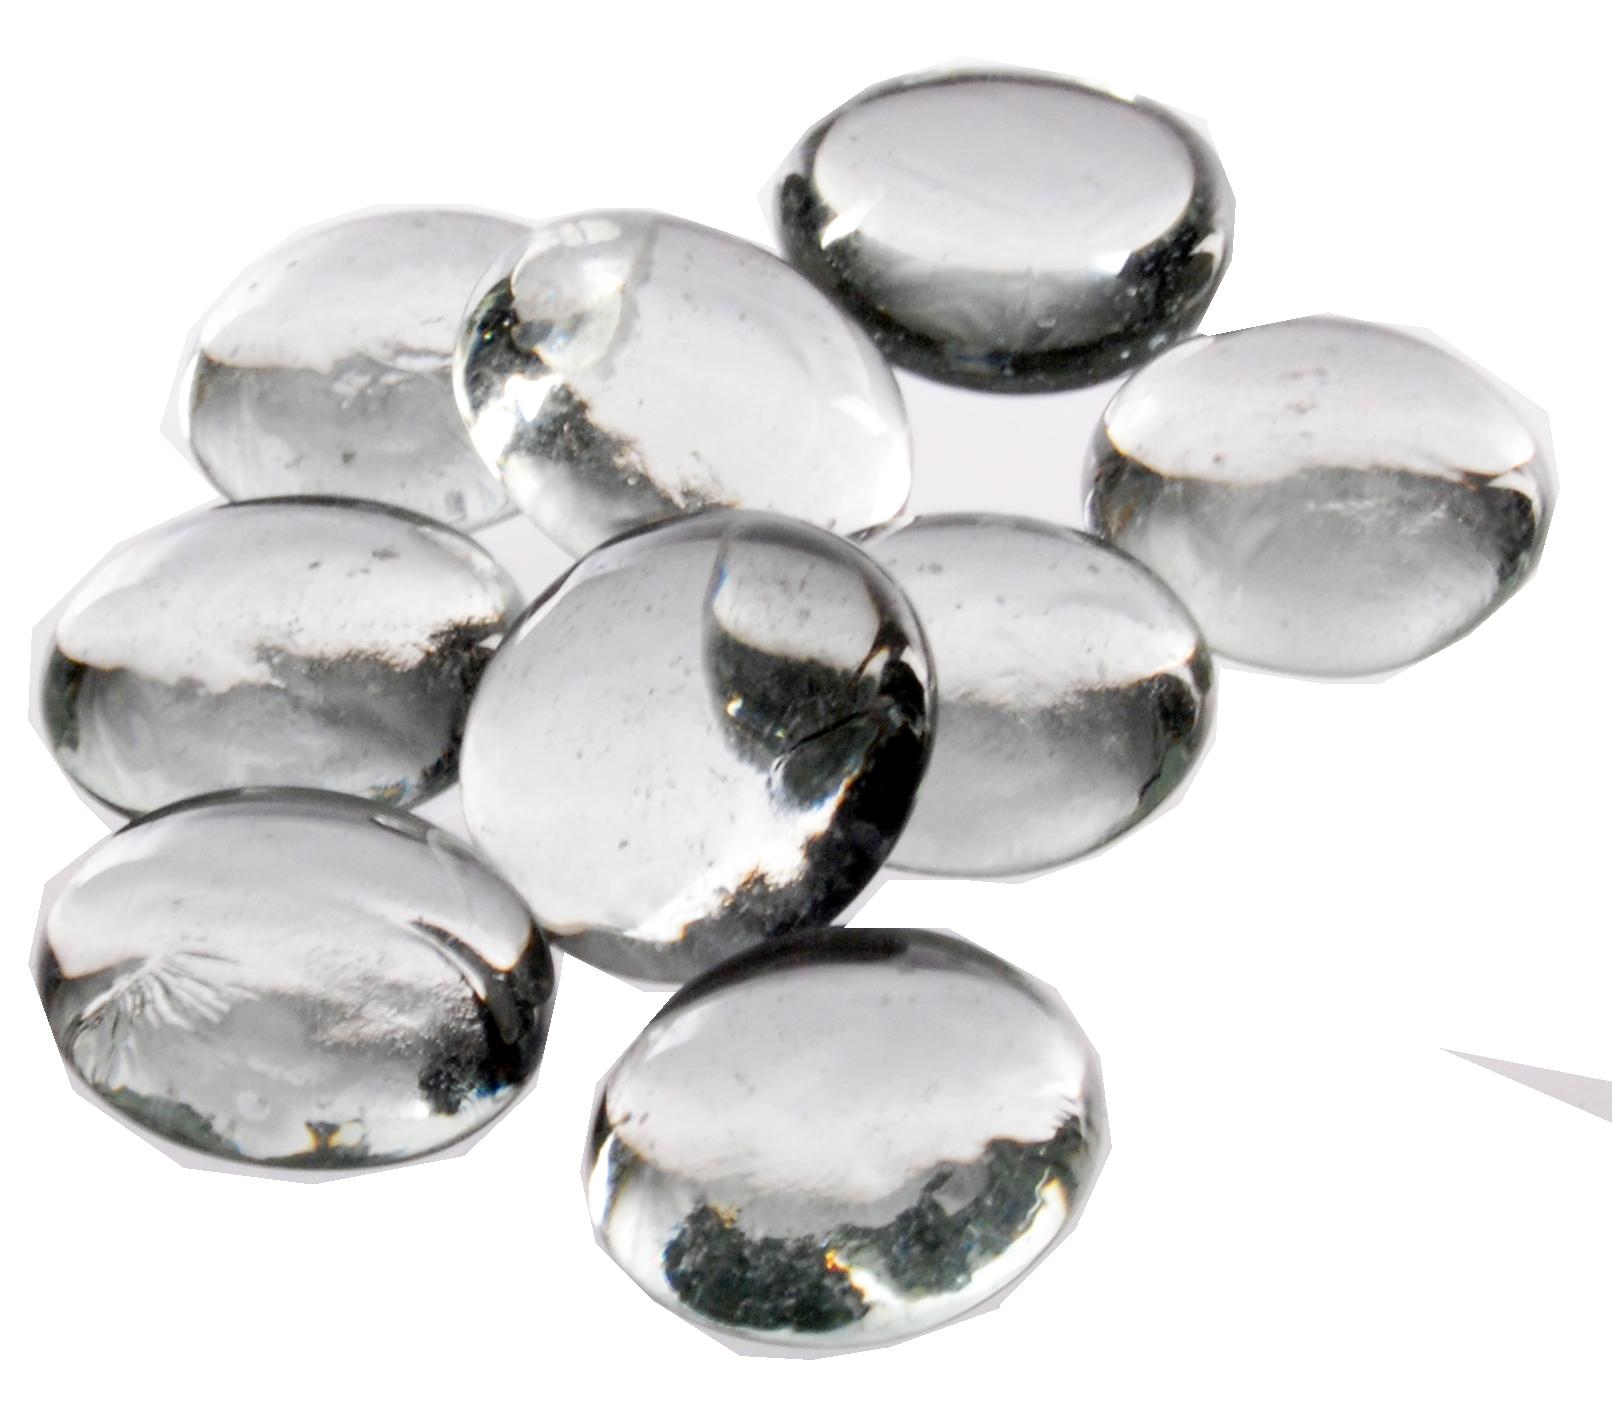 image Clear Glass Raindrop Vase Filler Stones